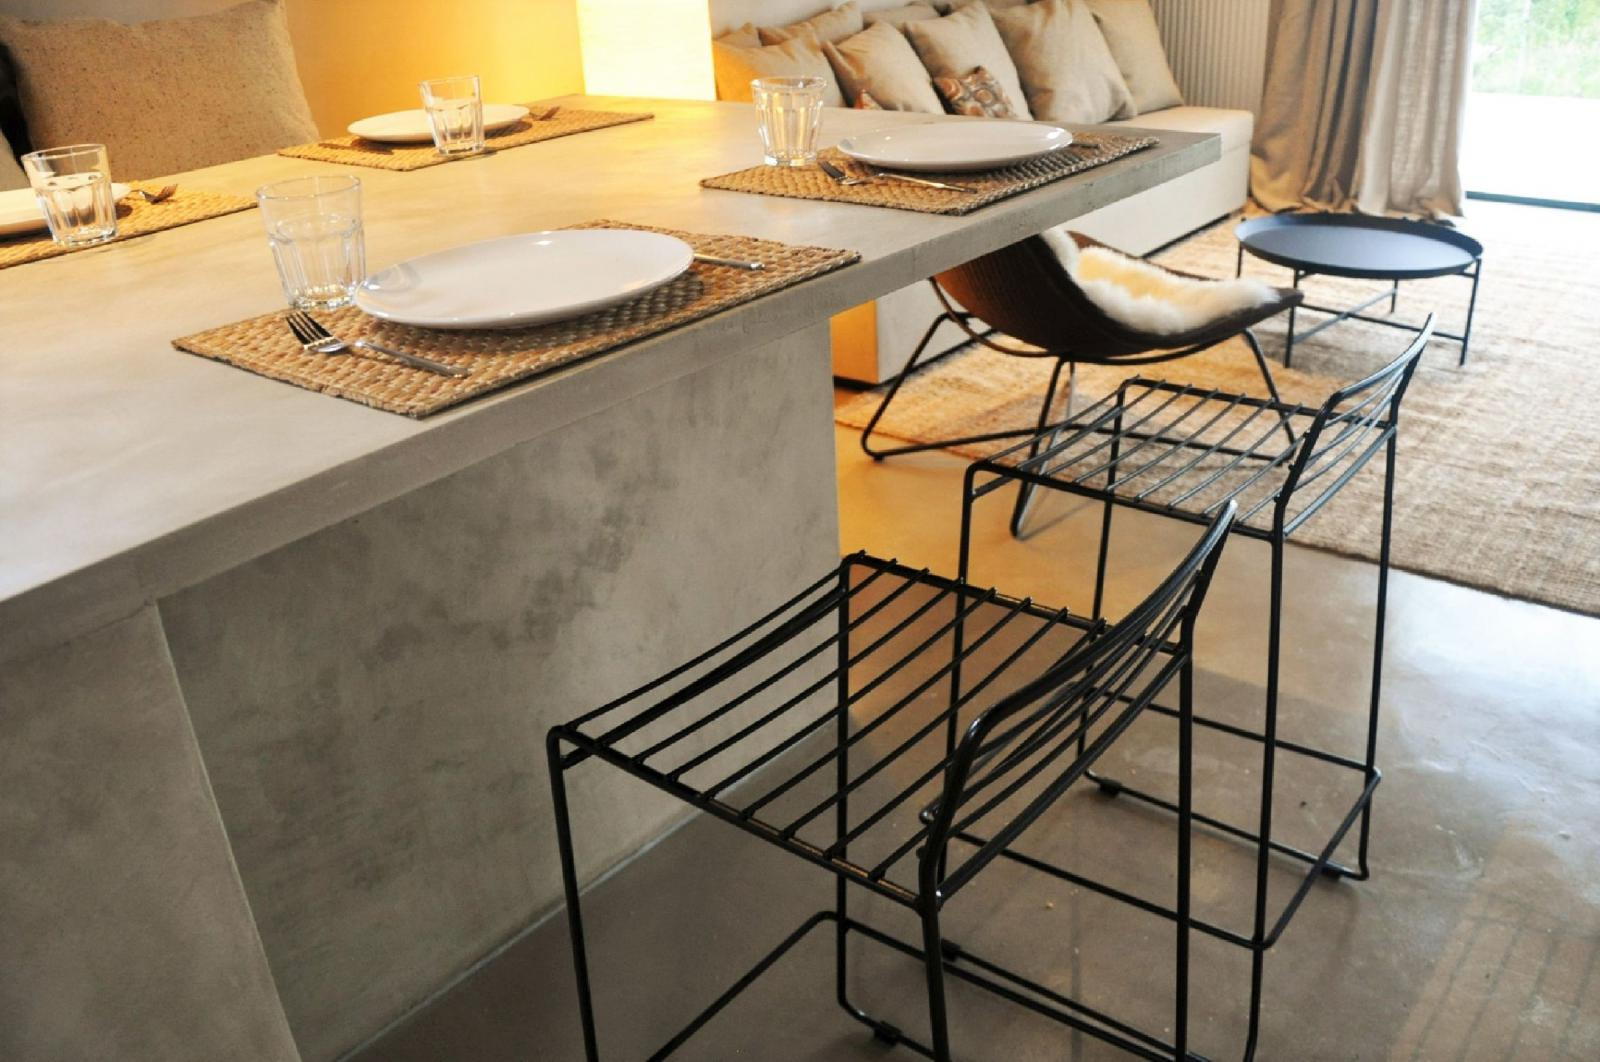 #interieurdesign #belgische kust #totaalinrichting #appartement #studio #woning #architect #binnenhuisarchitect #interiordesign